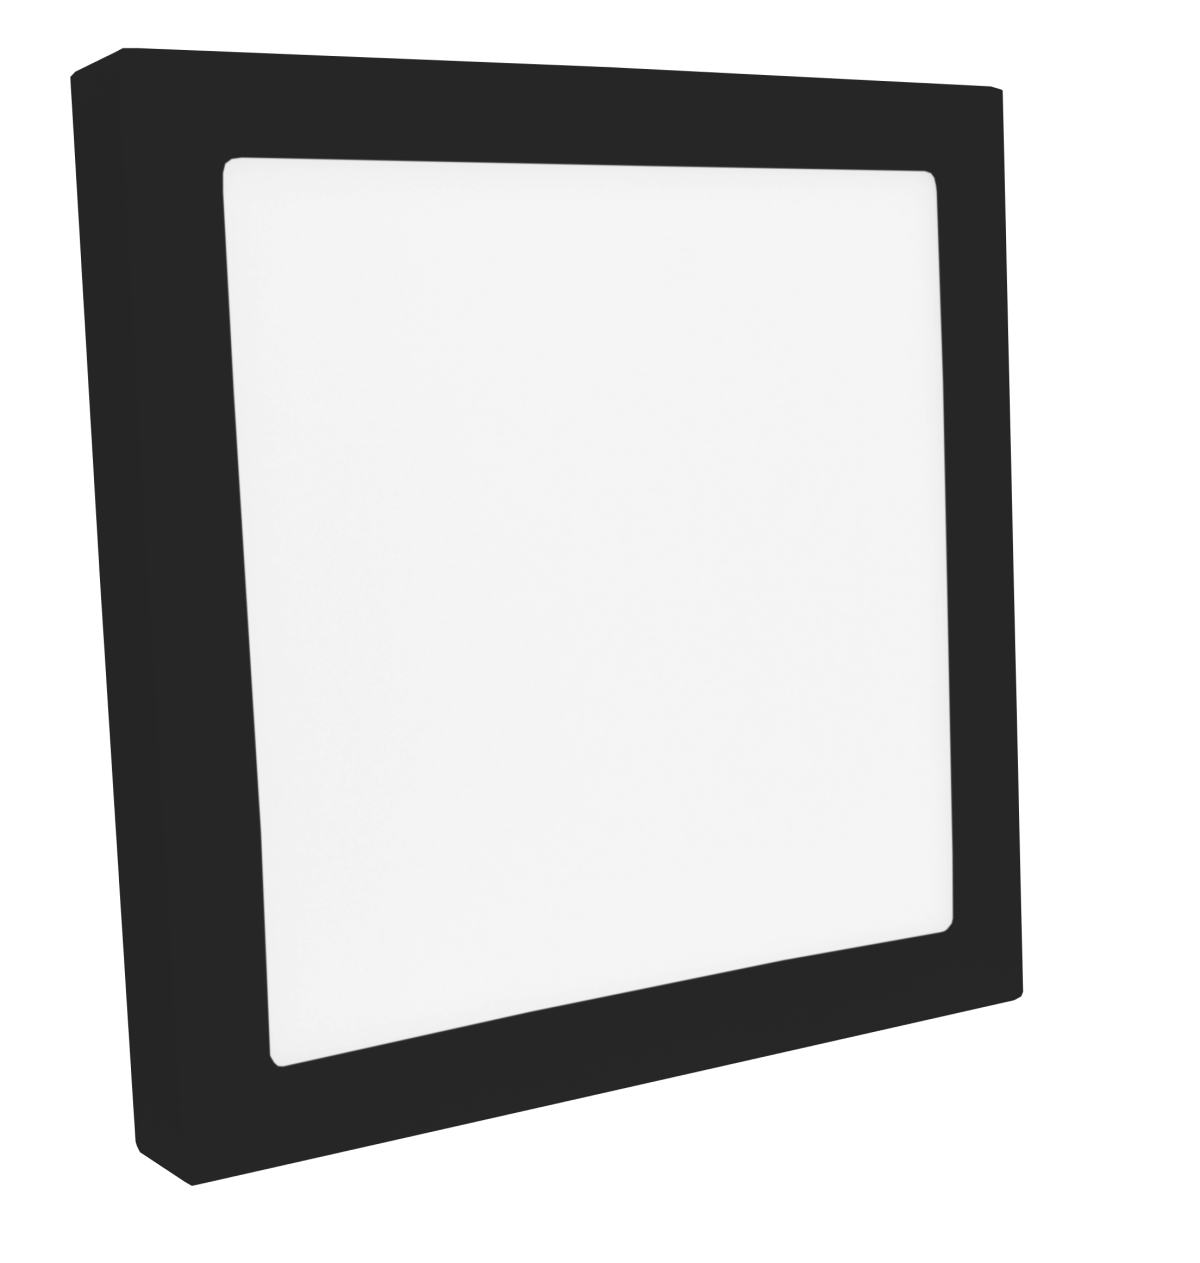 Luminária Sobrepor LED Save Energy SE-240.1619 Jet Black 25W 3000K Bivolt 300x300mm Preto